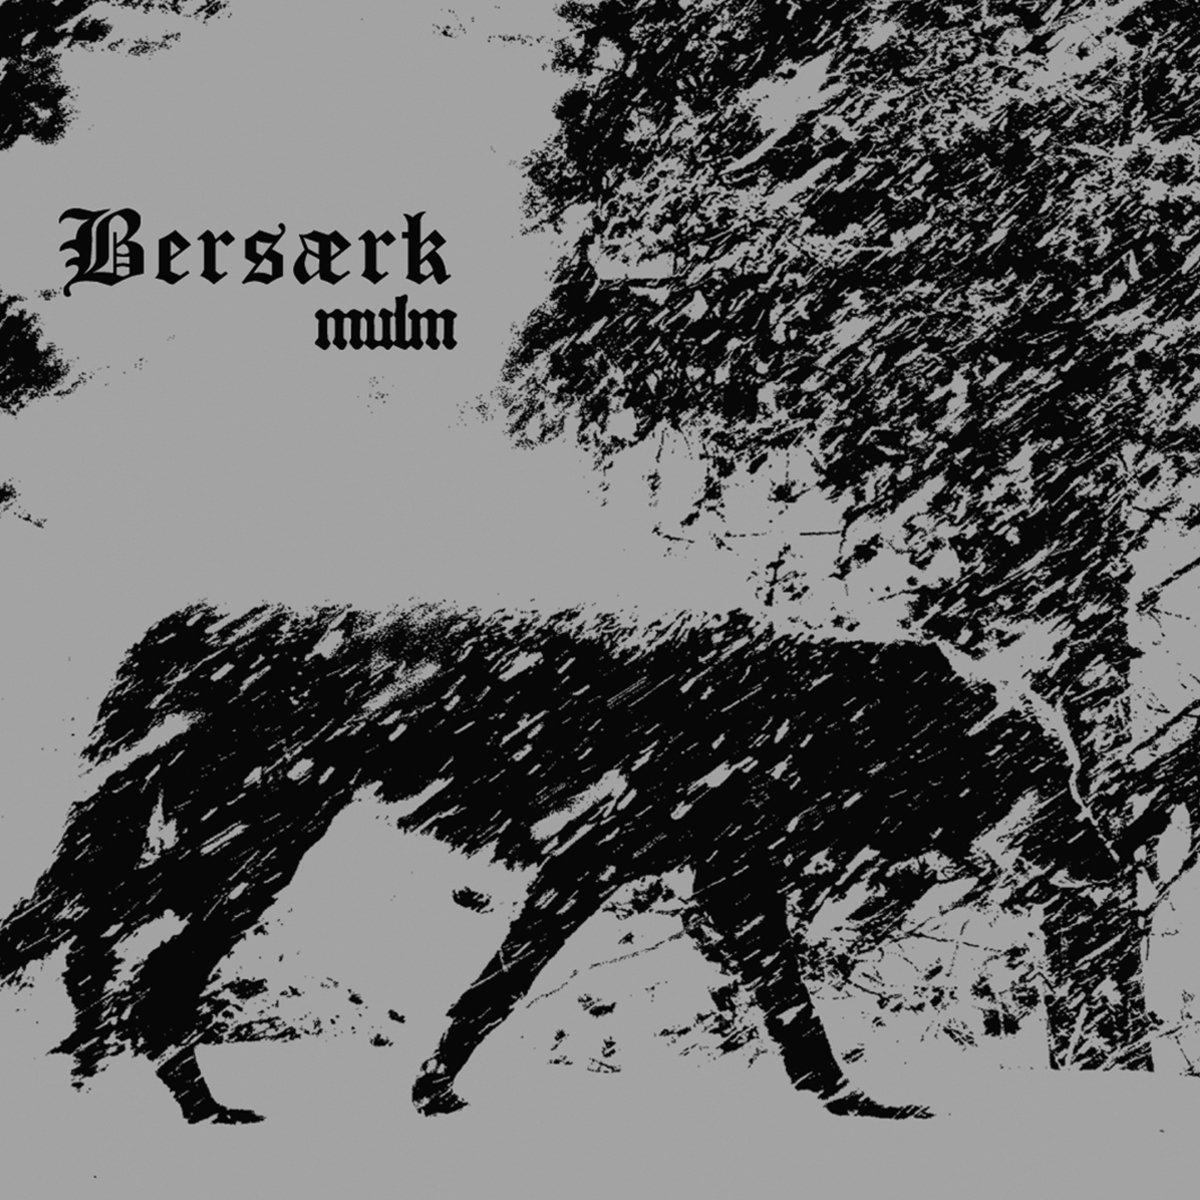 Mulm - Bersærk - Musik - Osmium Records - 9950991270001 - 2016